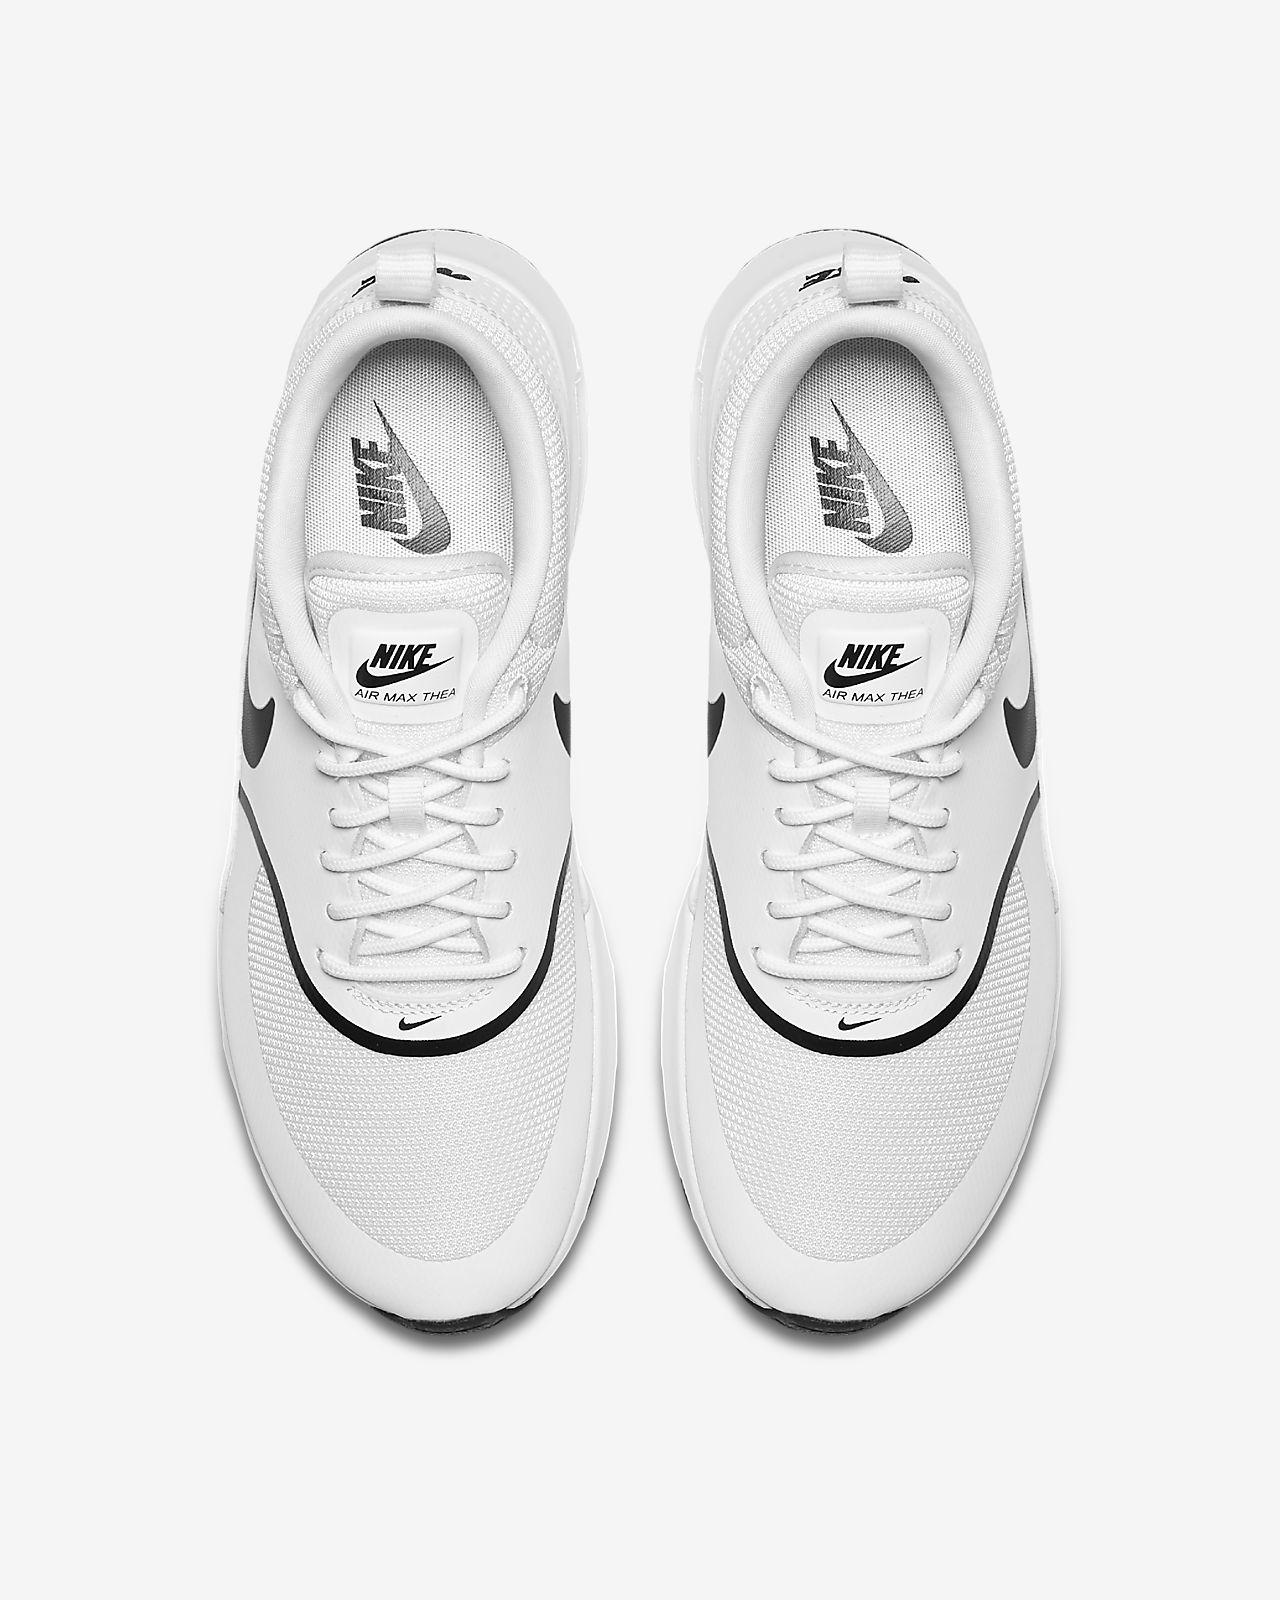 2018 Black Friday. Nouveauté Nike Air Max Thea Chaussure